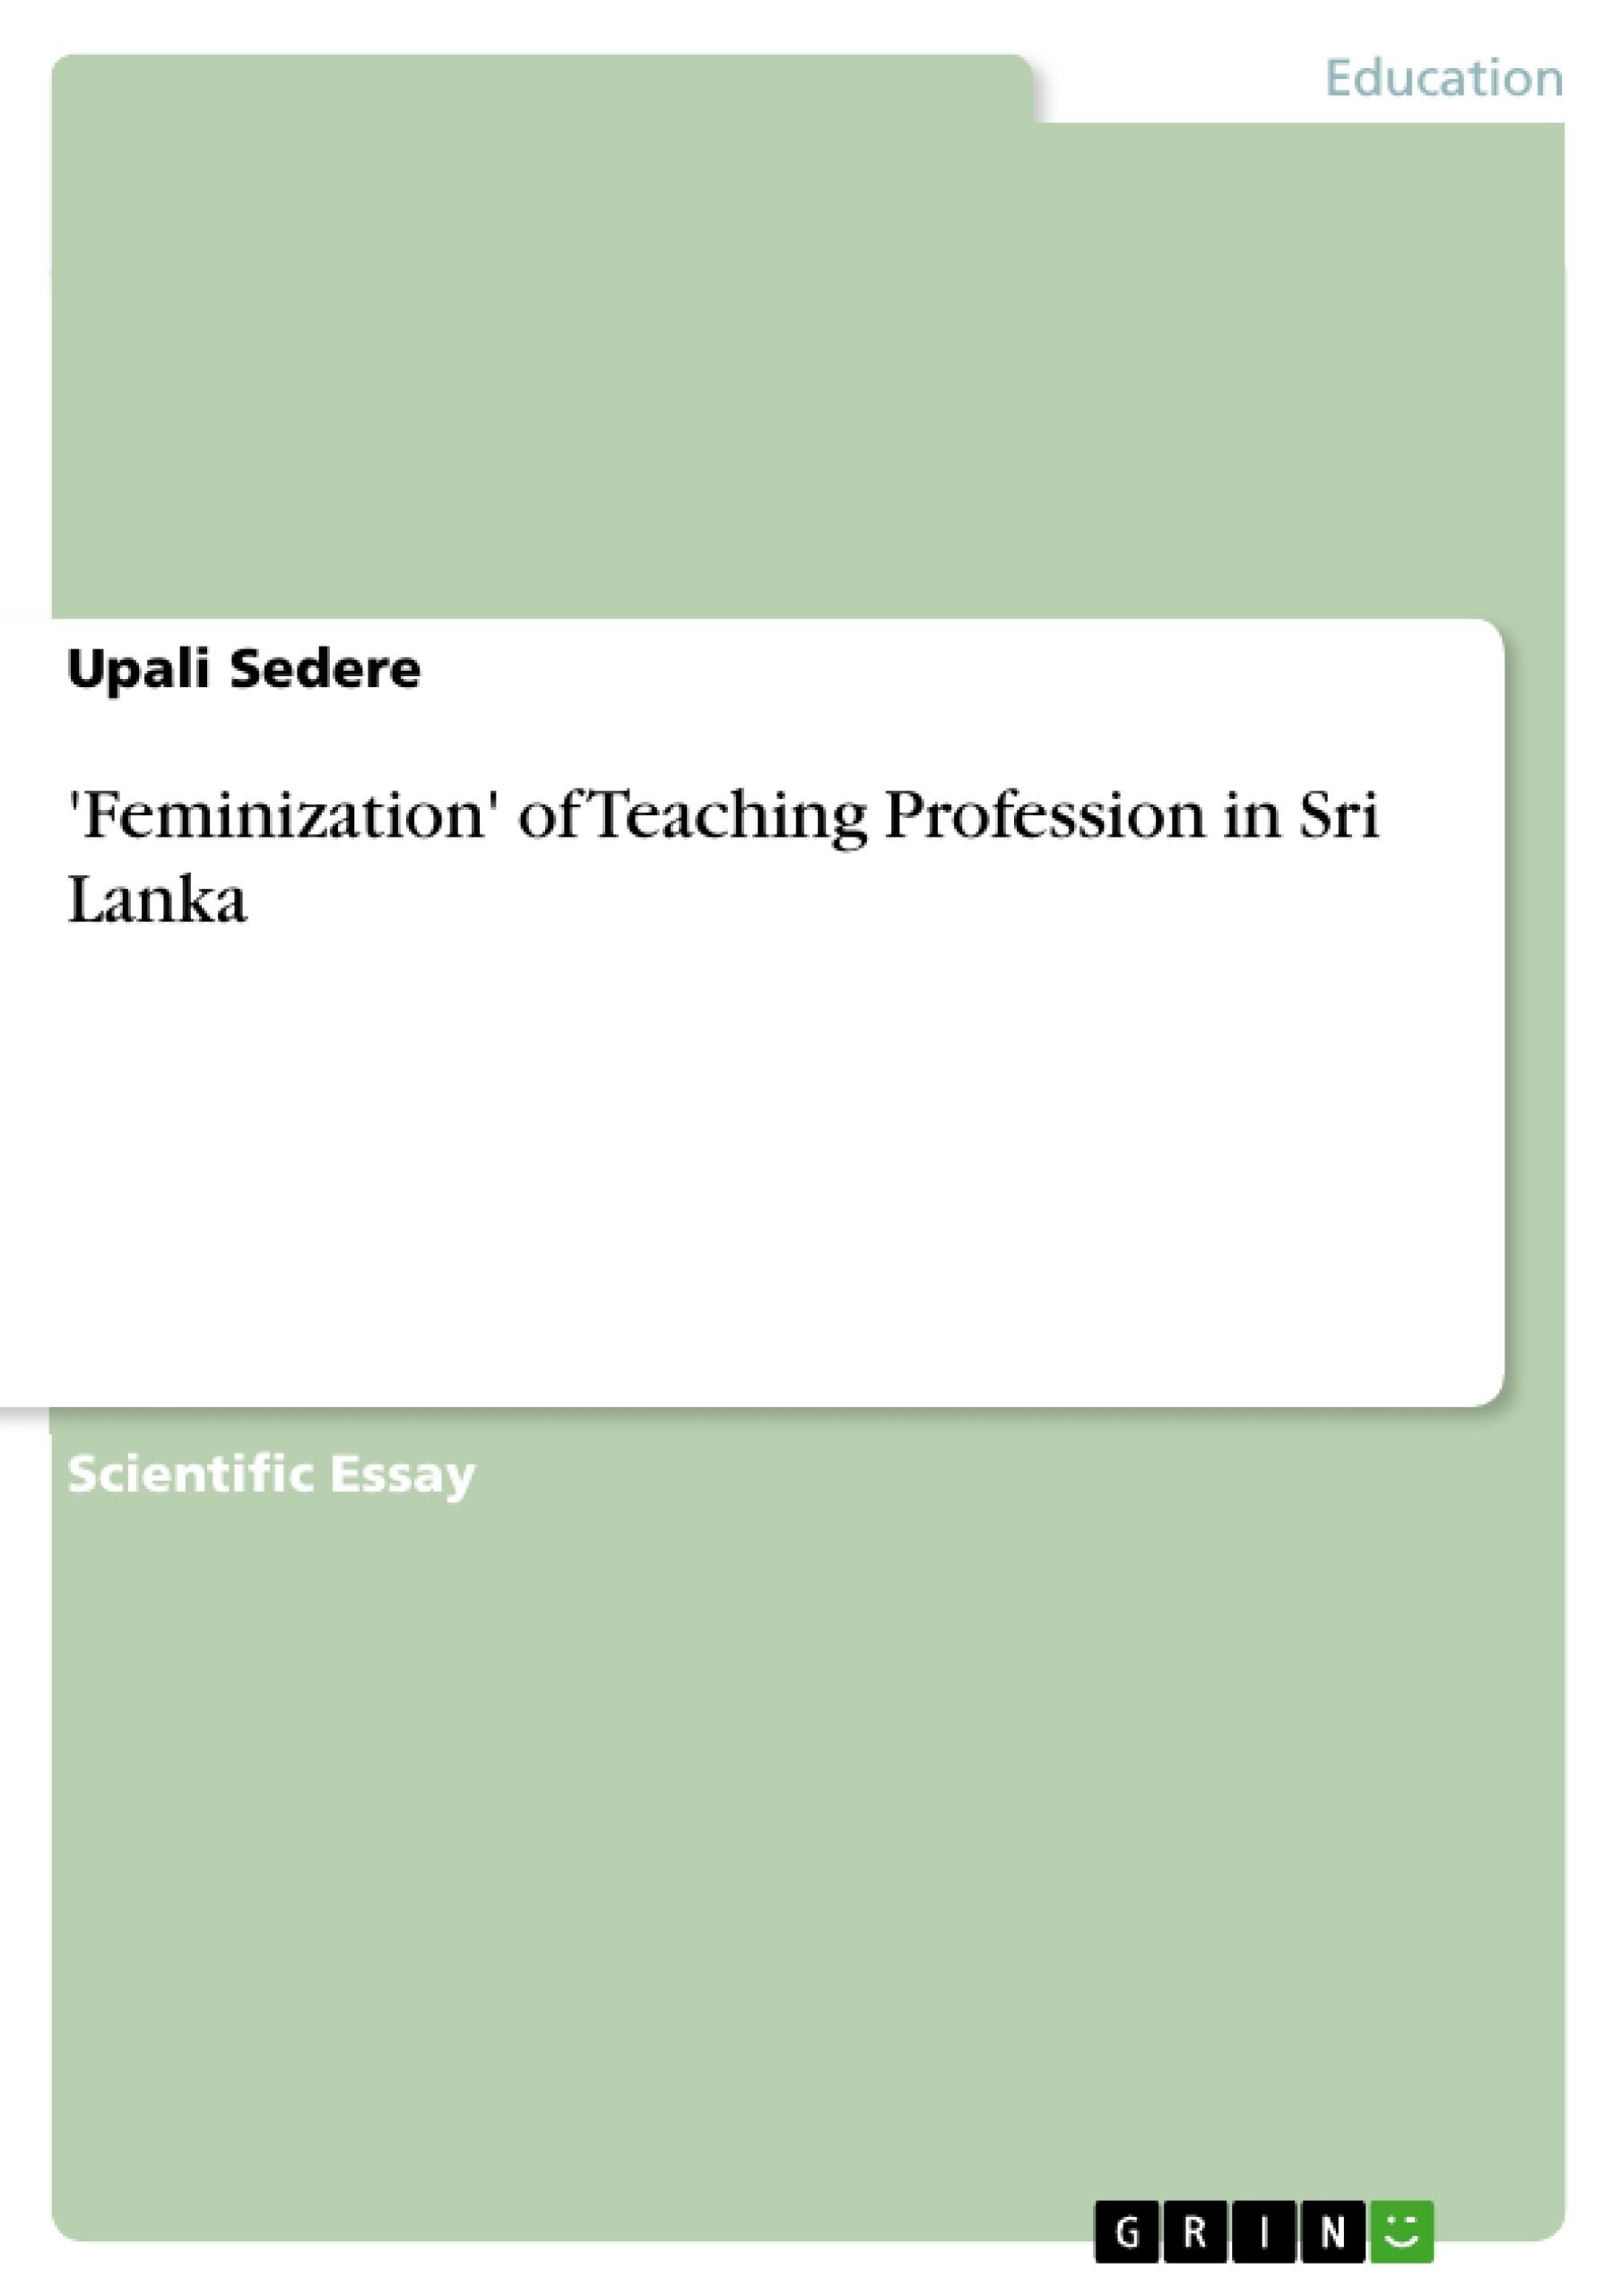 Title: 'Feminization' of Teaching Profession in Sri Lanka